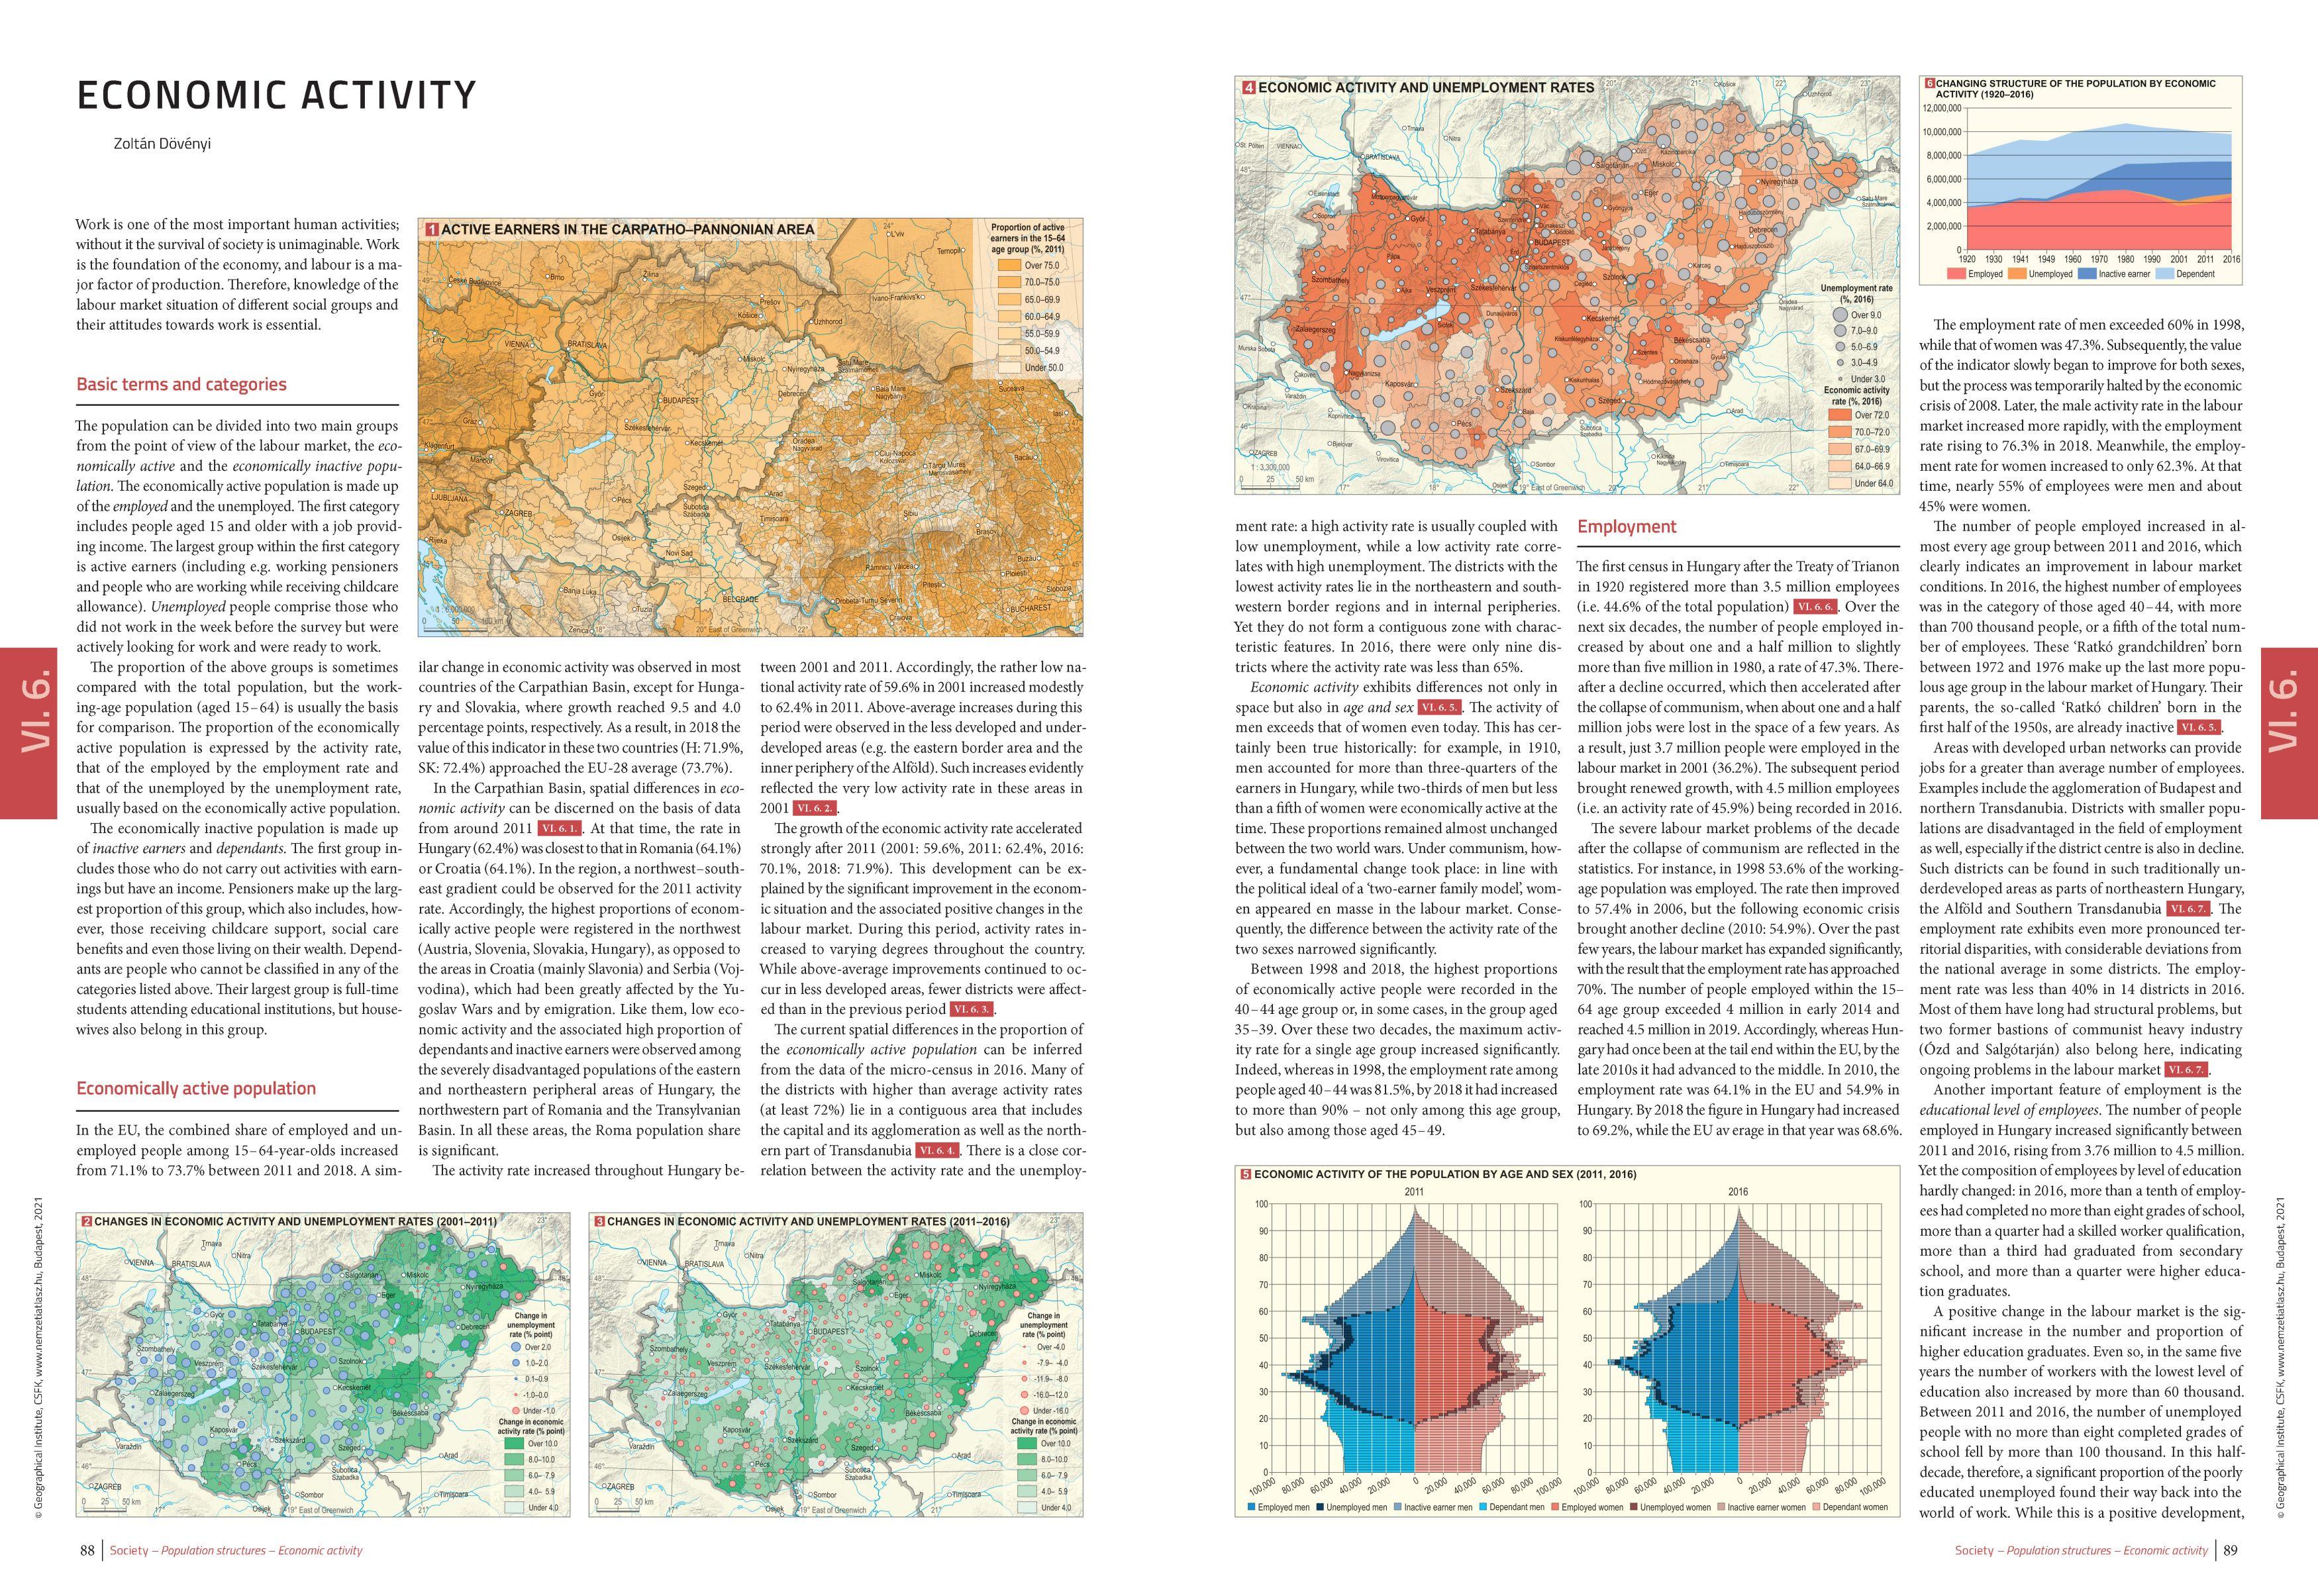 National atlas vol. 3. Society: Sample 2.